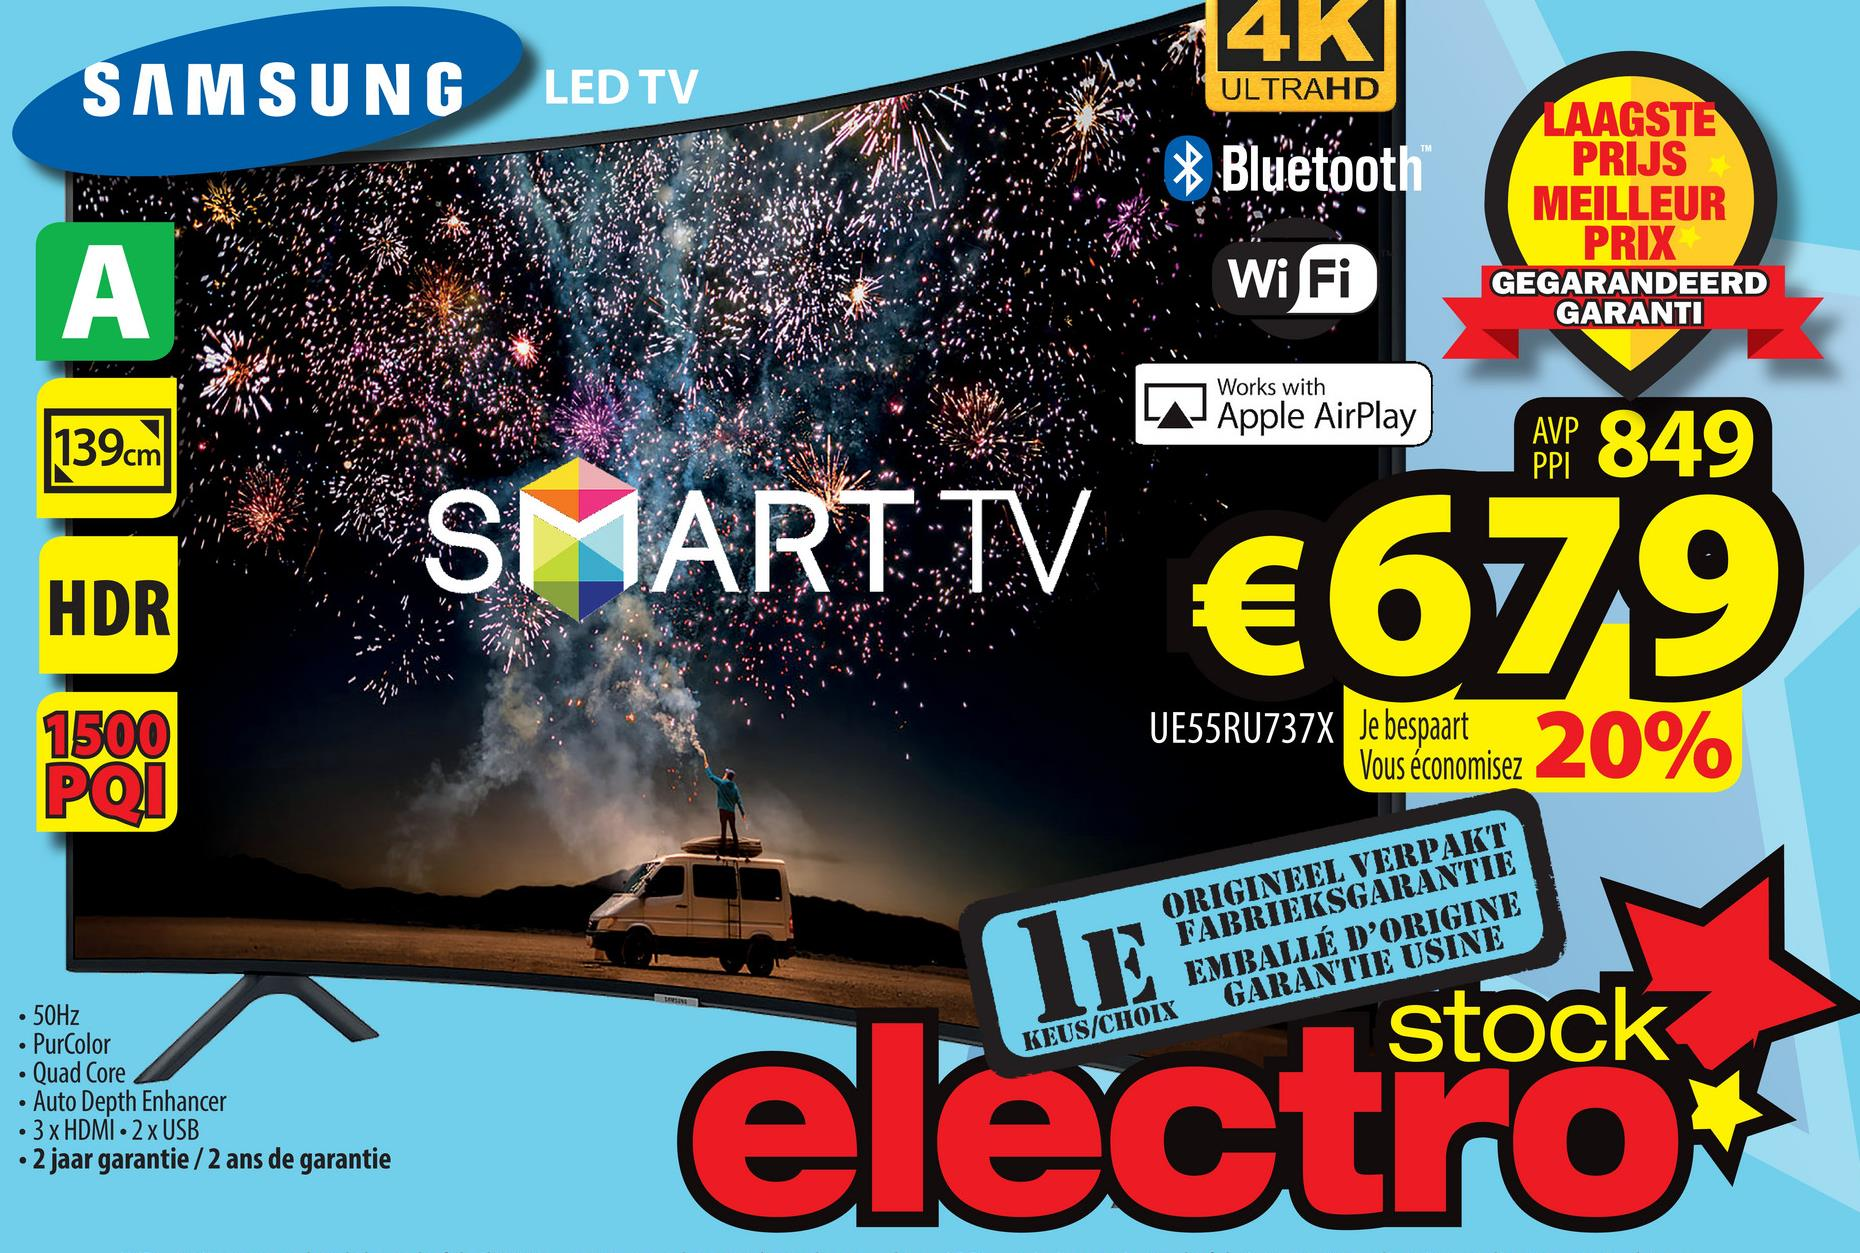 SAMSUNG LED TV 1 ULTRAHD 4K * Bluetooth WiFi LAAGSTE PRIJS MEILLEUR PRIX GEGARANDEERD GARANTI Works with LA Apple AirPlay 139cm I AWP 849 SMART TV € 679 HDR 1500 POI UE55RU737X Je bespaart Vous économisez ORIGINEEL VERPAKT FABRIEKSGARANTIE EMBALLÉ D'ORIGINE KEUS/CHOIX GARANTIE USINE stock . 50Hz • PurColor • Quad Core • Auto Depth Enhancer • 3 x HDMI 2 x USB • 2 jaar garantie/2 ans de garantie electrooks